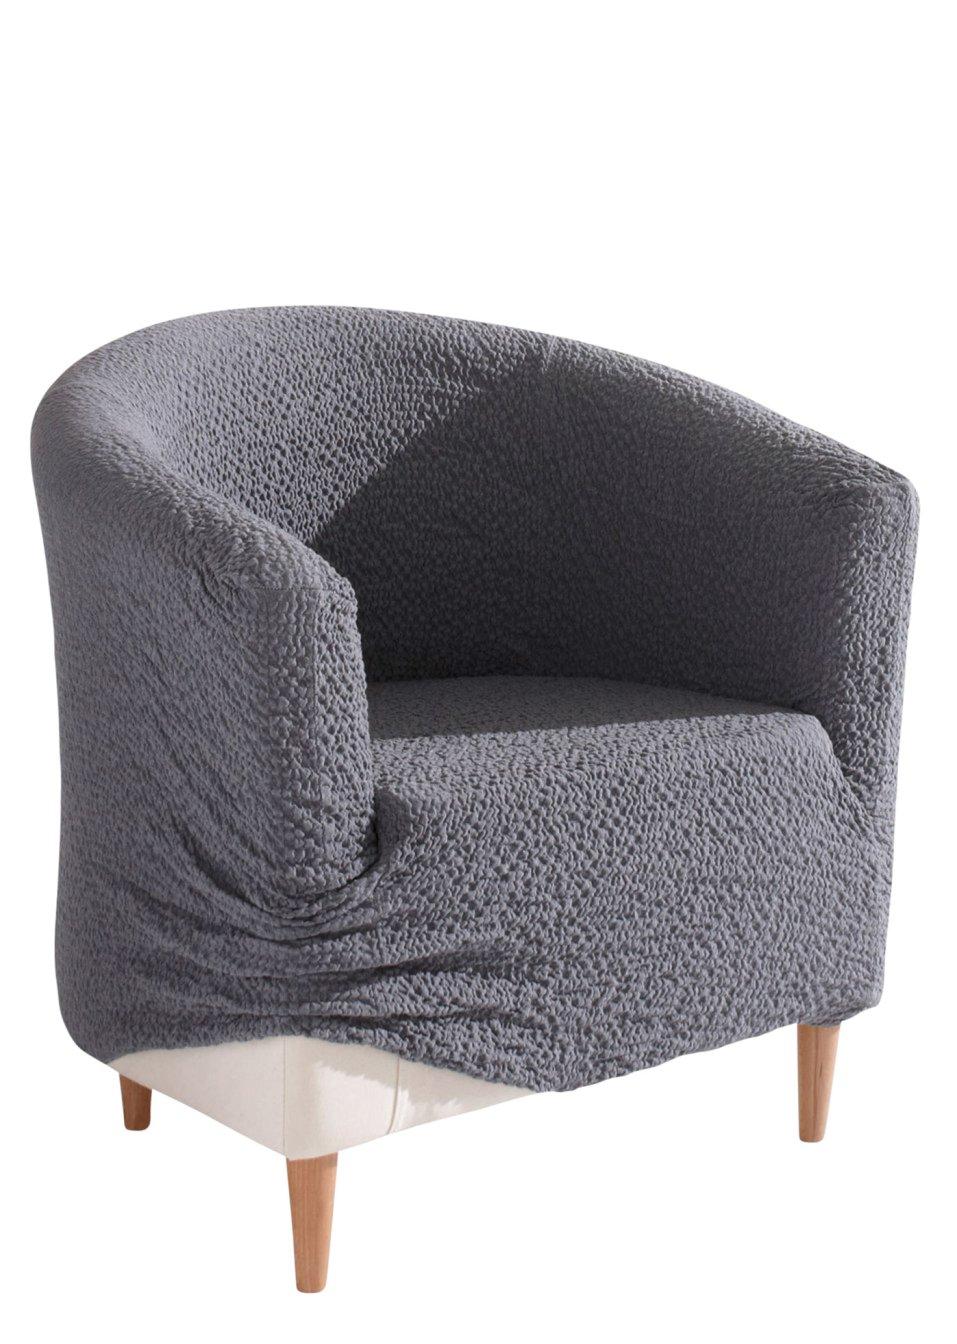 fauteuilhoes crinkle antraciet wonen bpc living. Black Bedroom Furniture Sets. Home Design Ideas